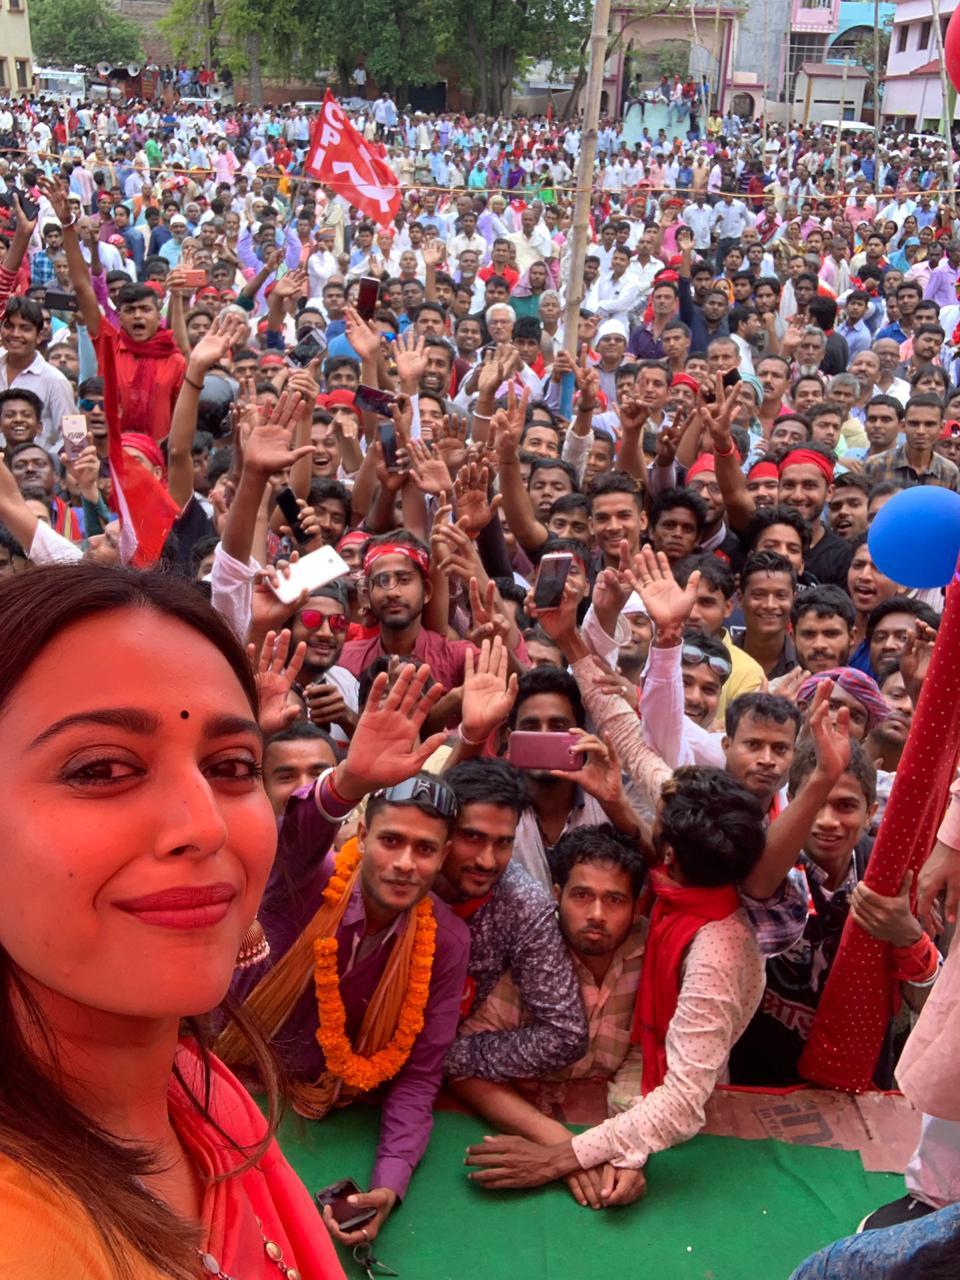 Swara Bhaskar's 'Political' Birthday In Bihar